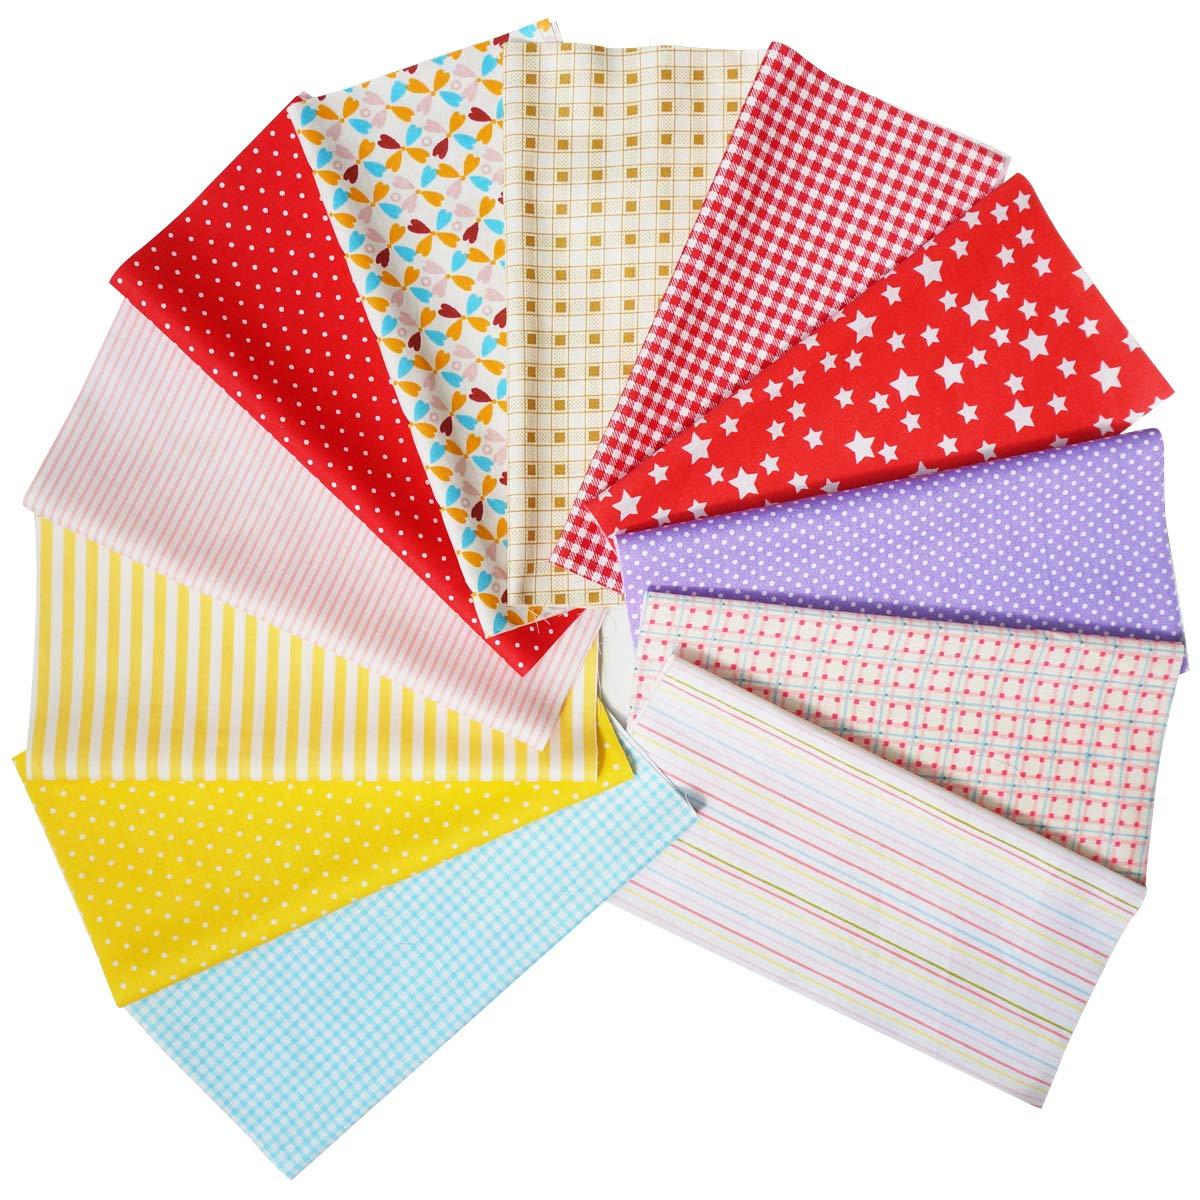 Quilting Fabric Misscrafts Cotton Craft Fabric Bundle Squares Patchwork Pre-Cut Quilt Squares for DIY Sewing Scrapbooking Quilting Dot Pattern 50PCS 30X30cm